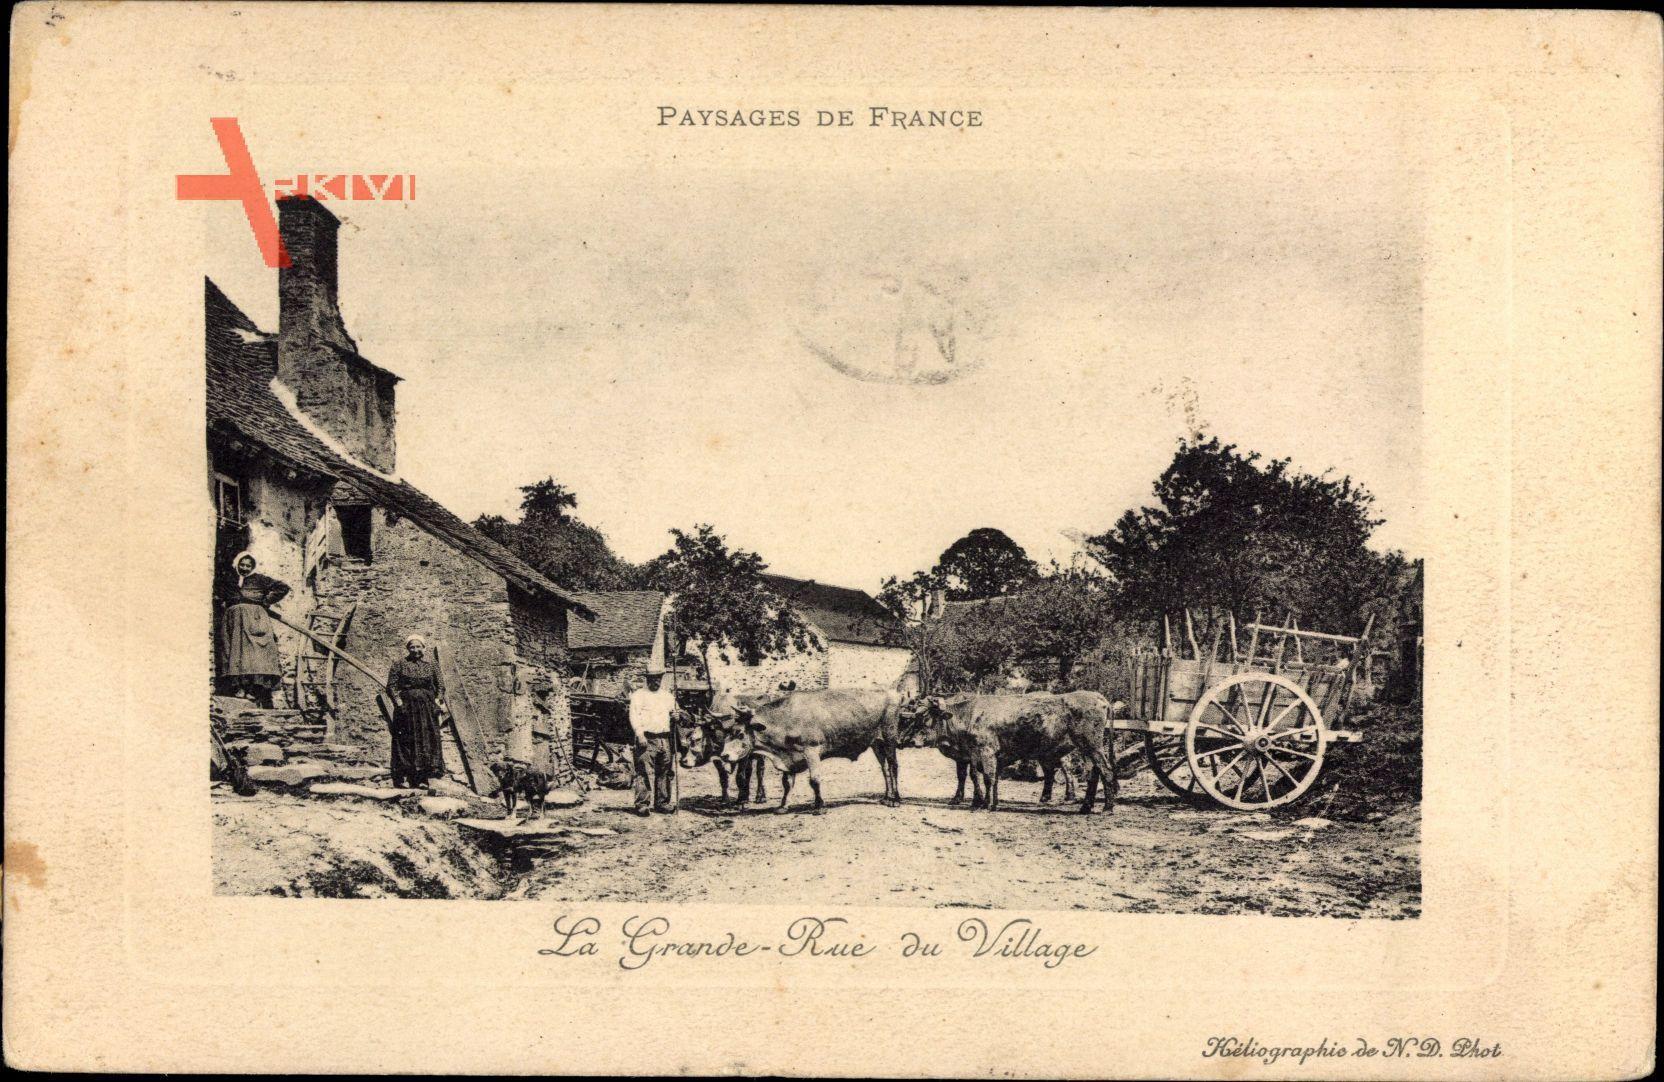 Paysages de France, La Grande Rue du Village, Bauernhof, Ochsenkarren